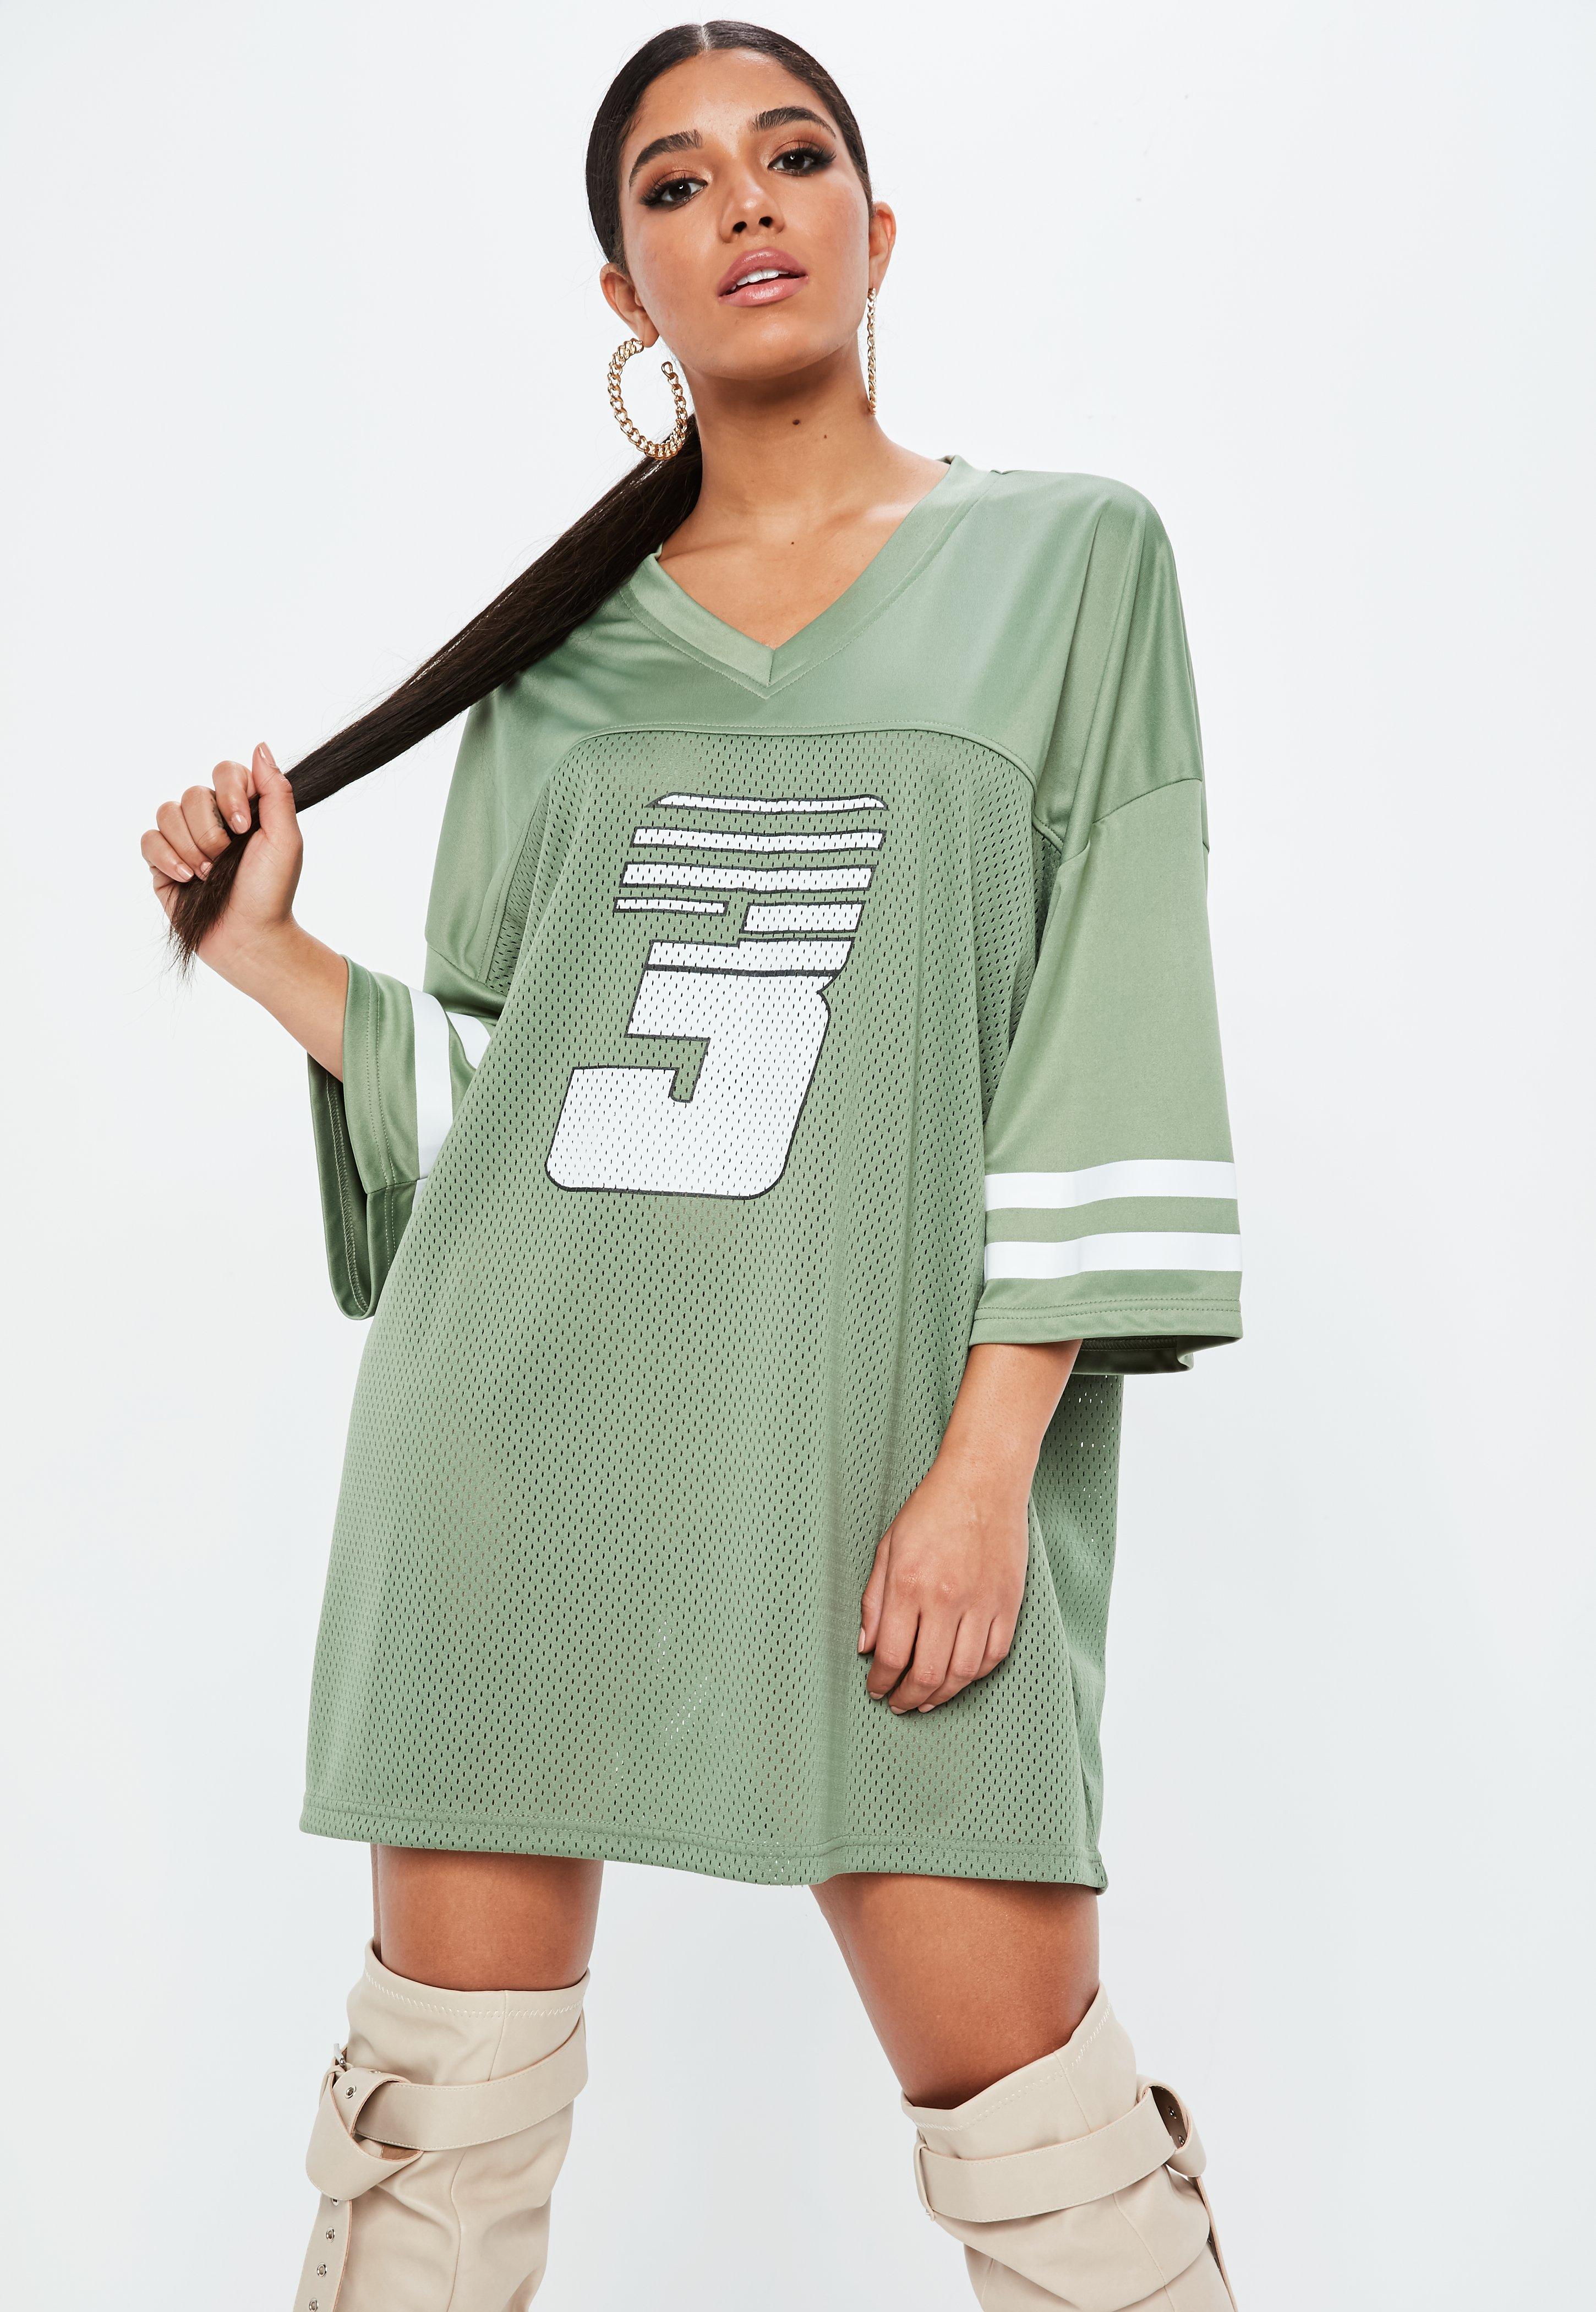 Lyst - Missguided Green American Football Mesh T-shirt Dress in Green 6ec928be9